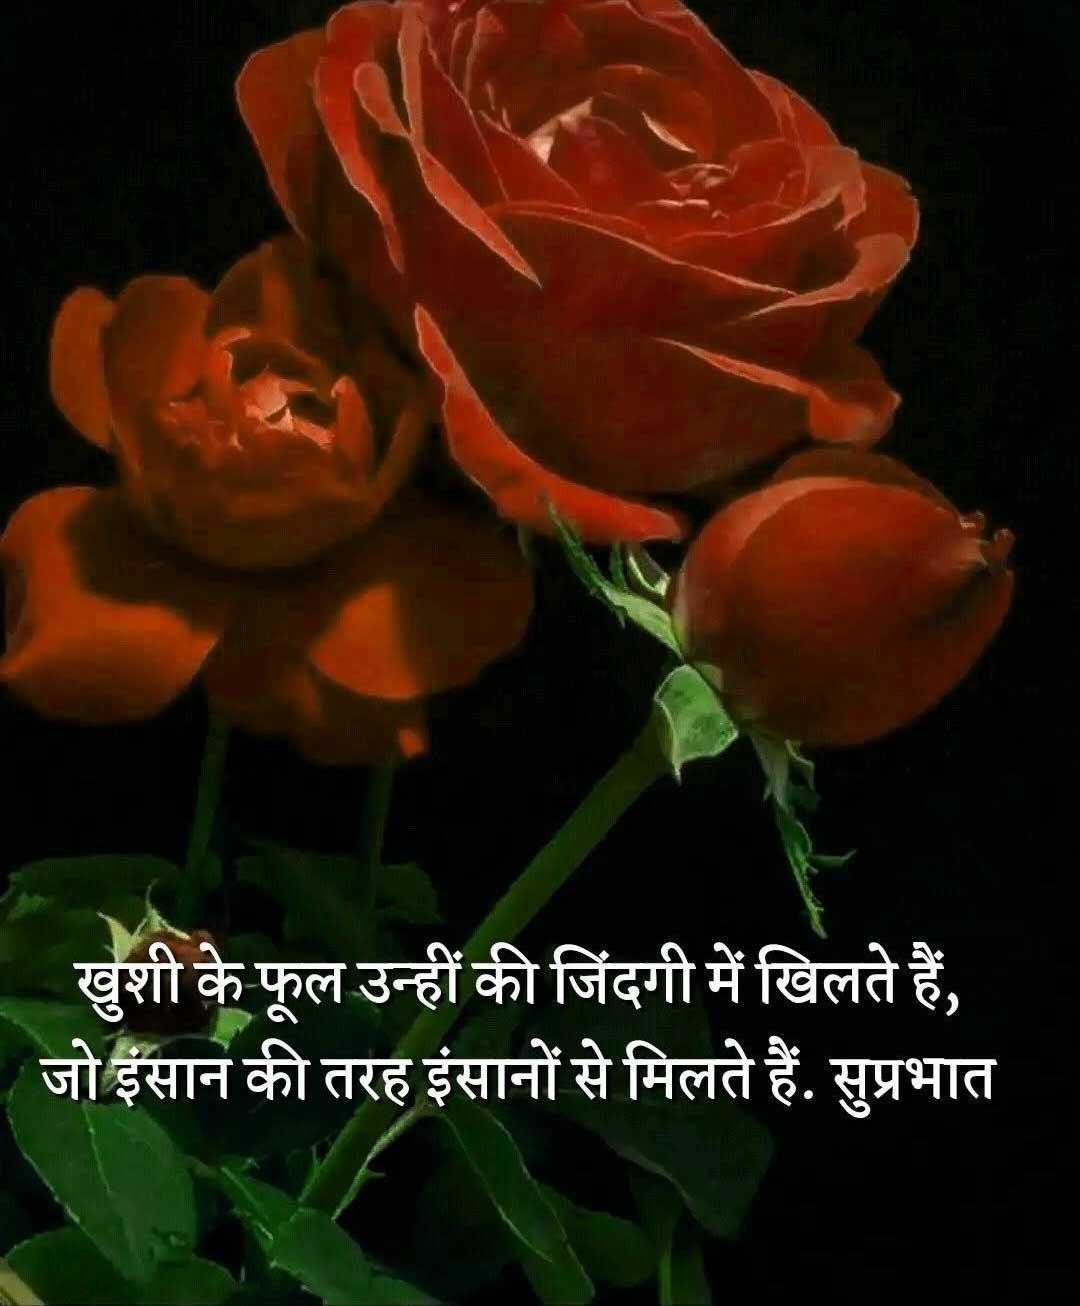 Shayari Whatsapp DP Images Hd